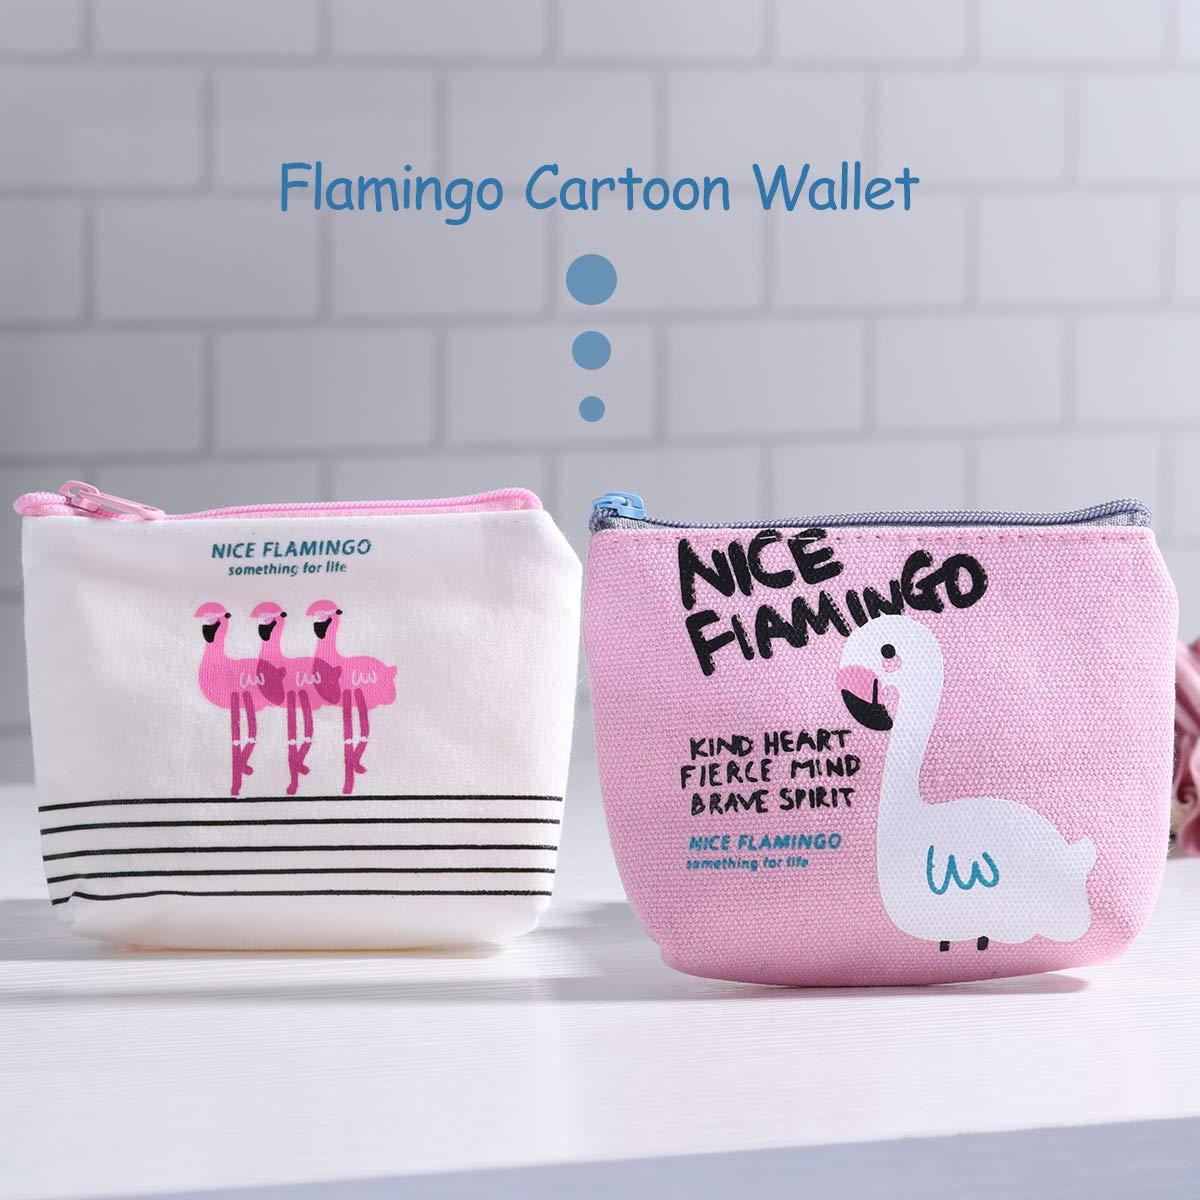 4Pcs TOYMYTOY Flamingo Wallet Cute Cartoon Flamingo Canvas Coin Purse Zipper Wallet Coin Bags